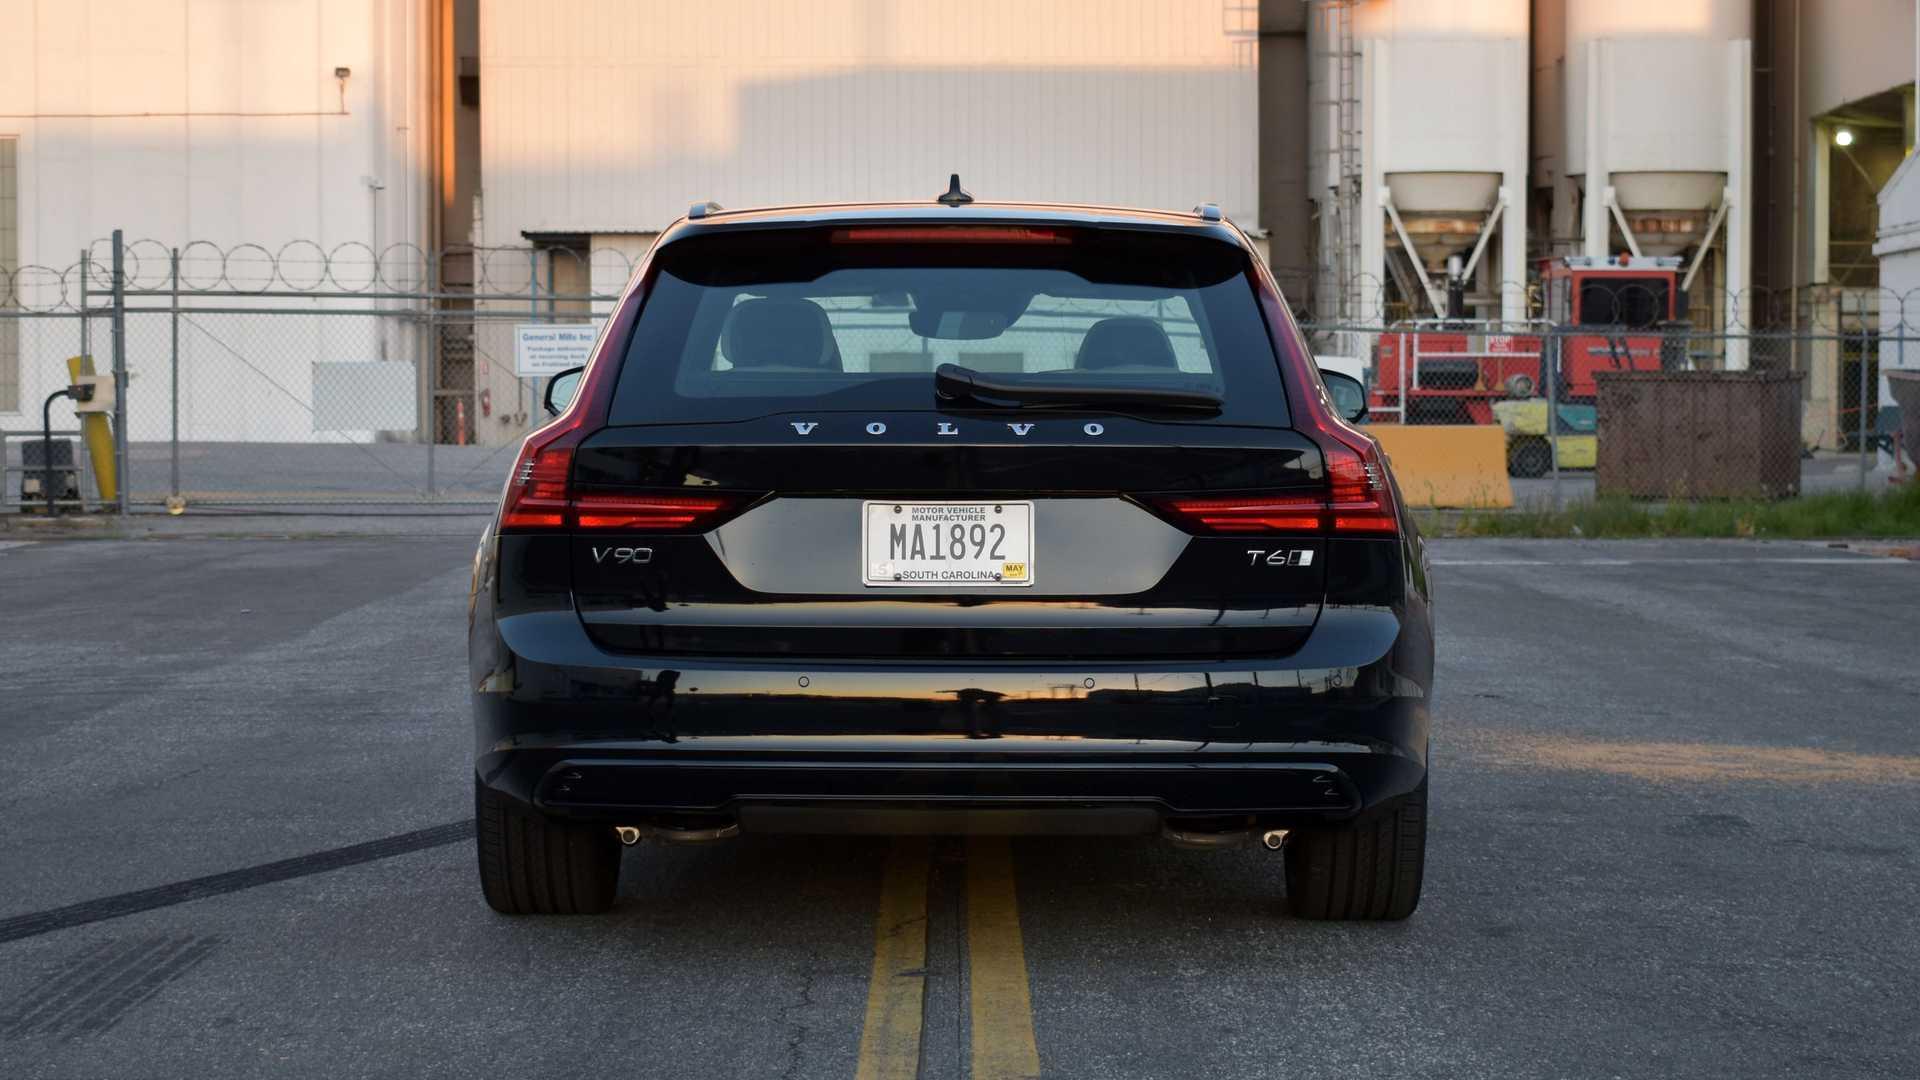 2021-volvo-v90-t6-r-design-awd-exterior-rear-view.jpg